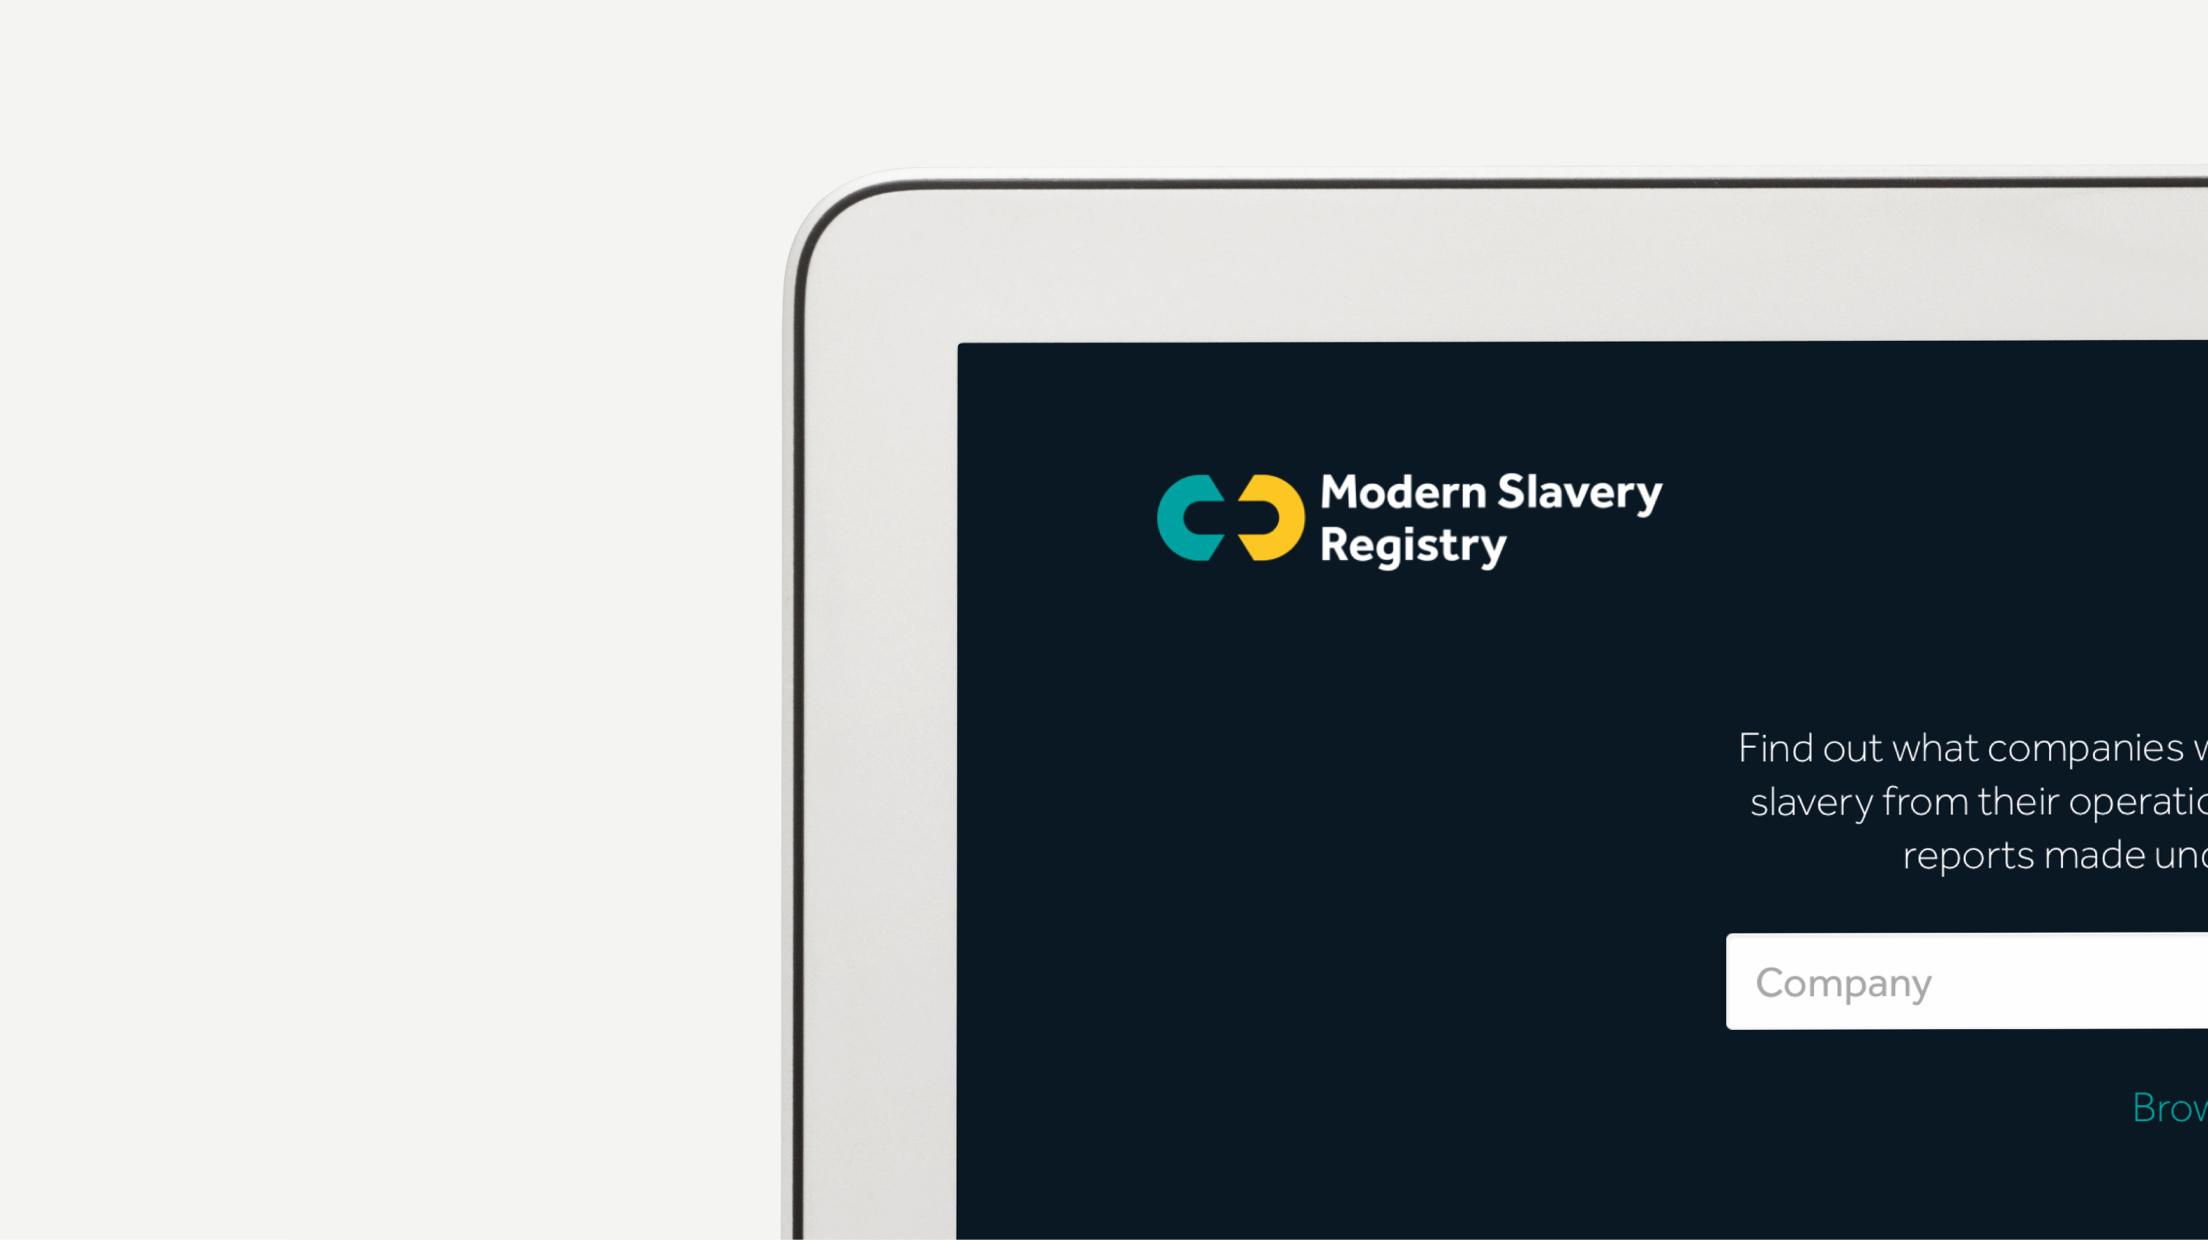 Modern Slavery Registry